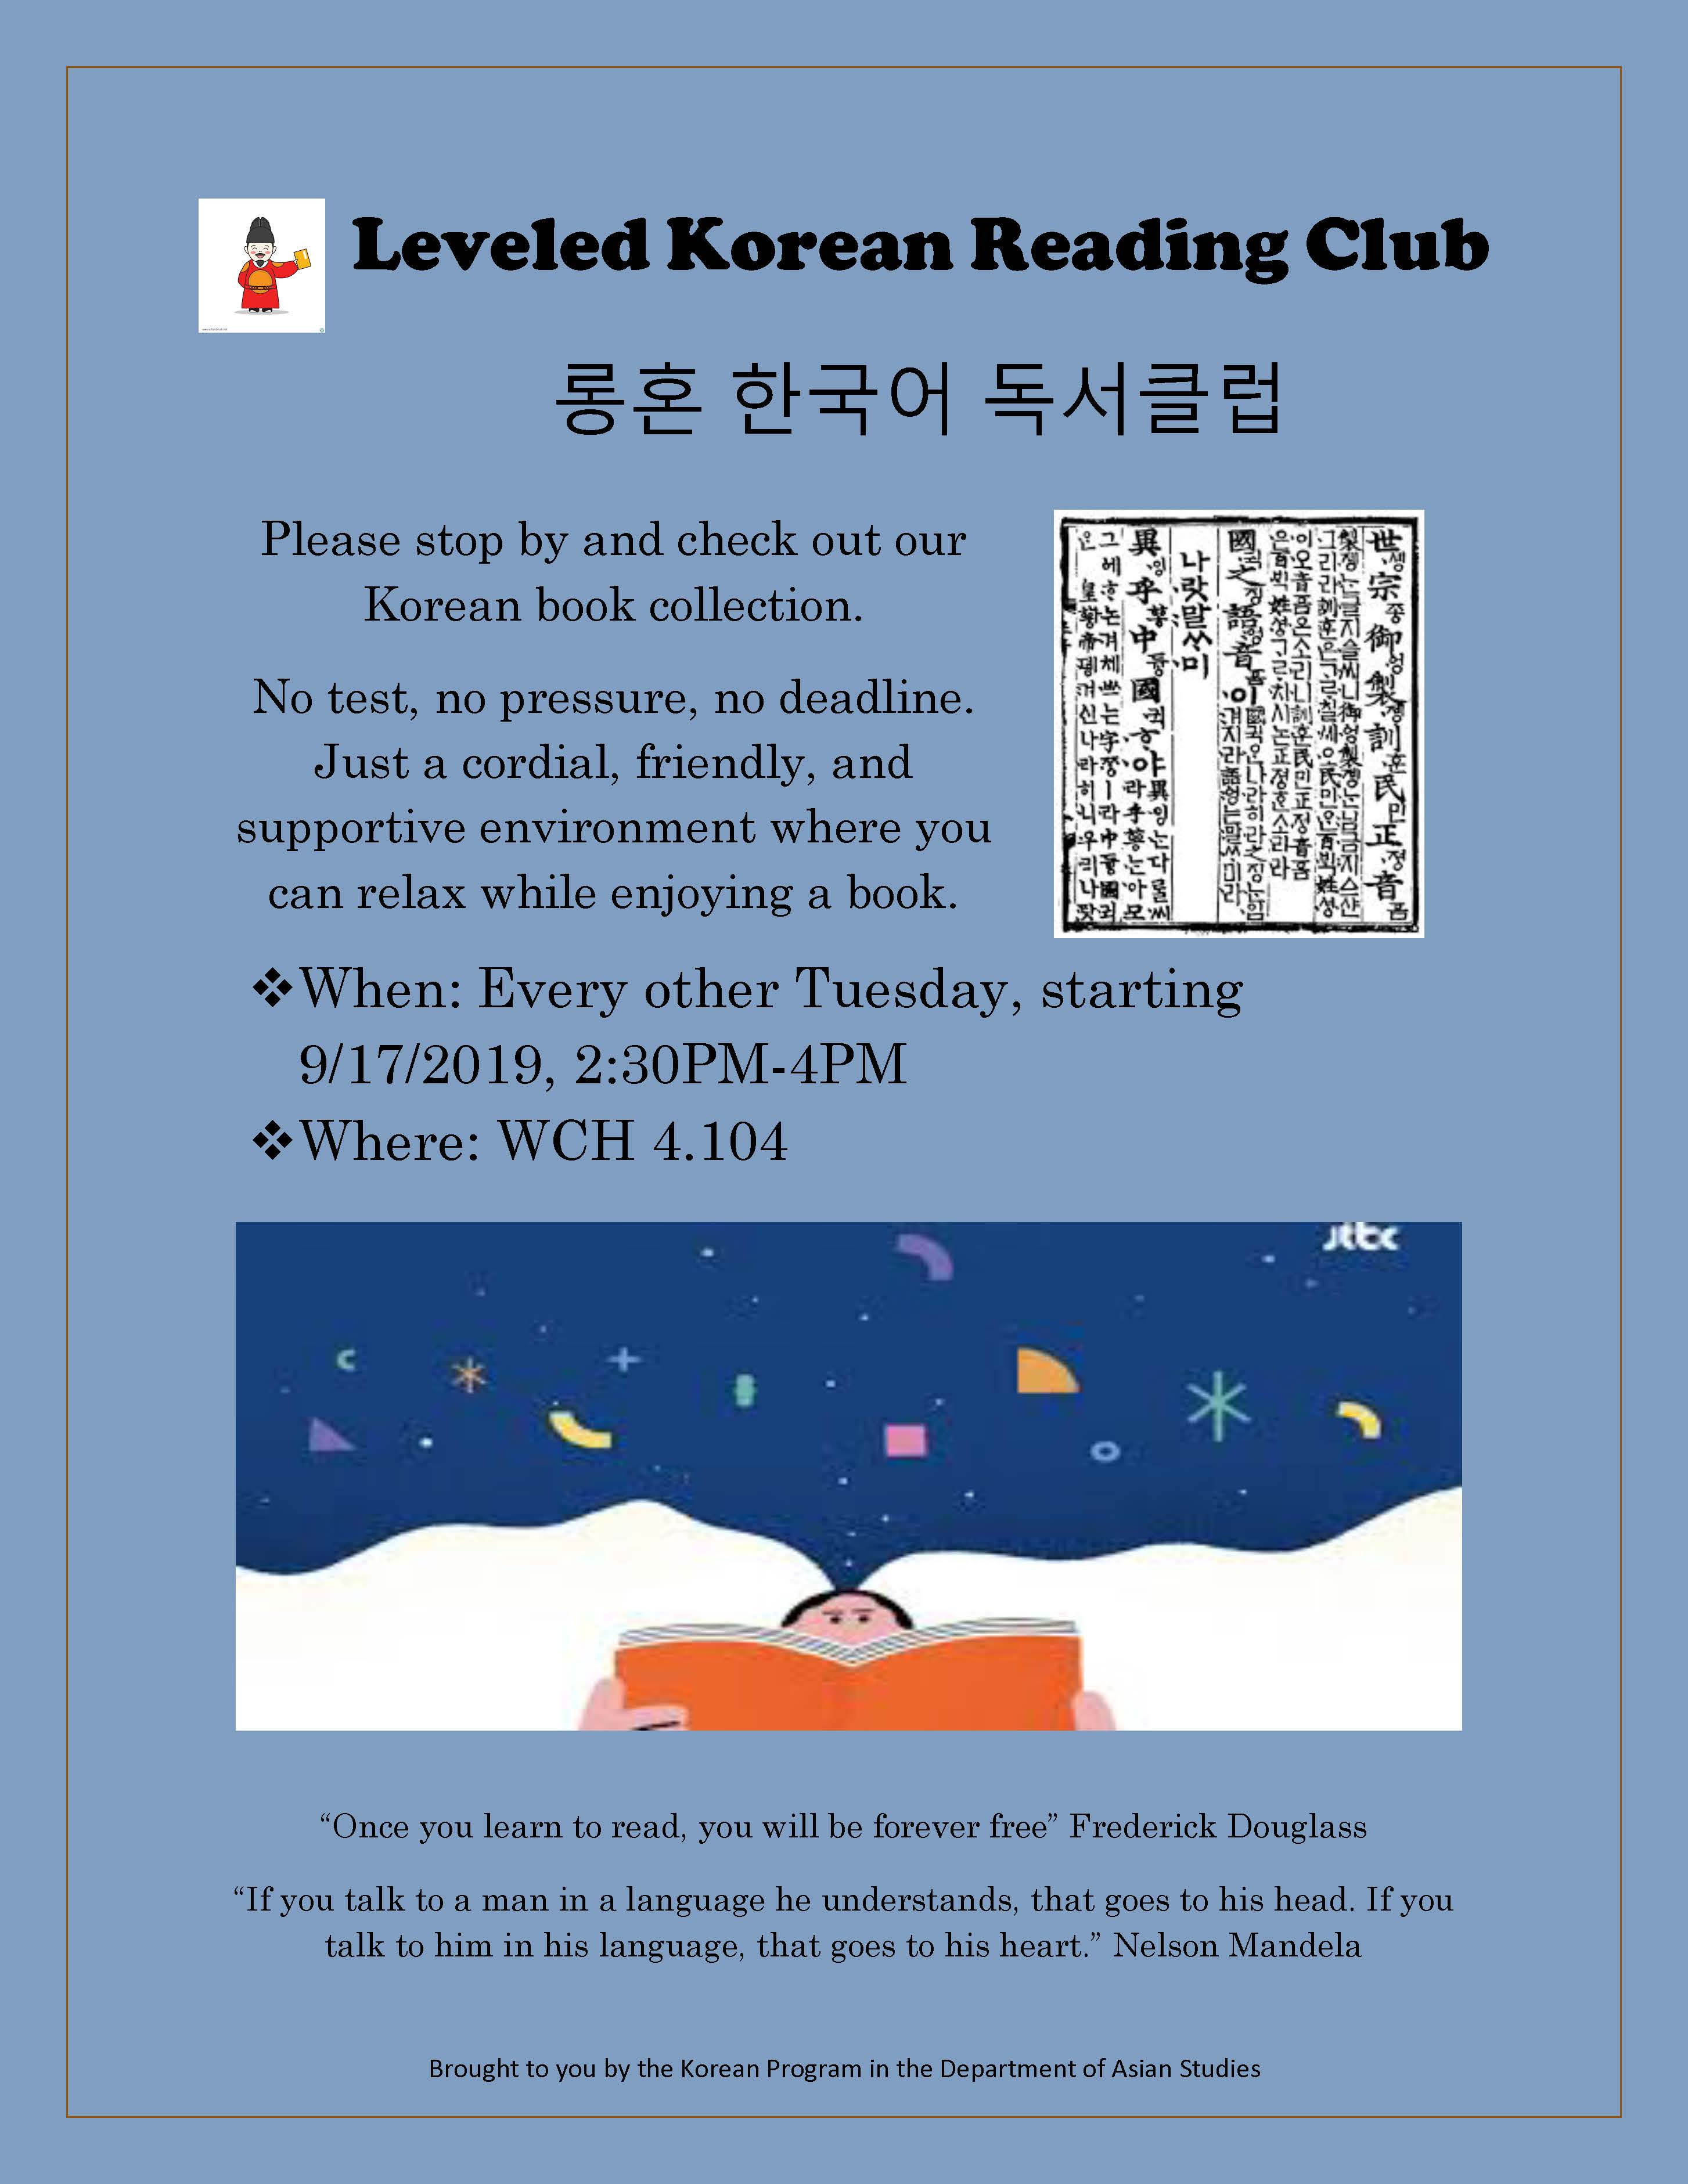 Leveled Korean Reading Club